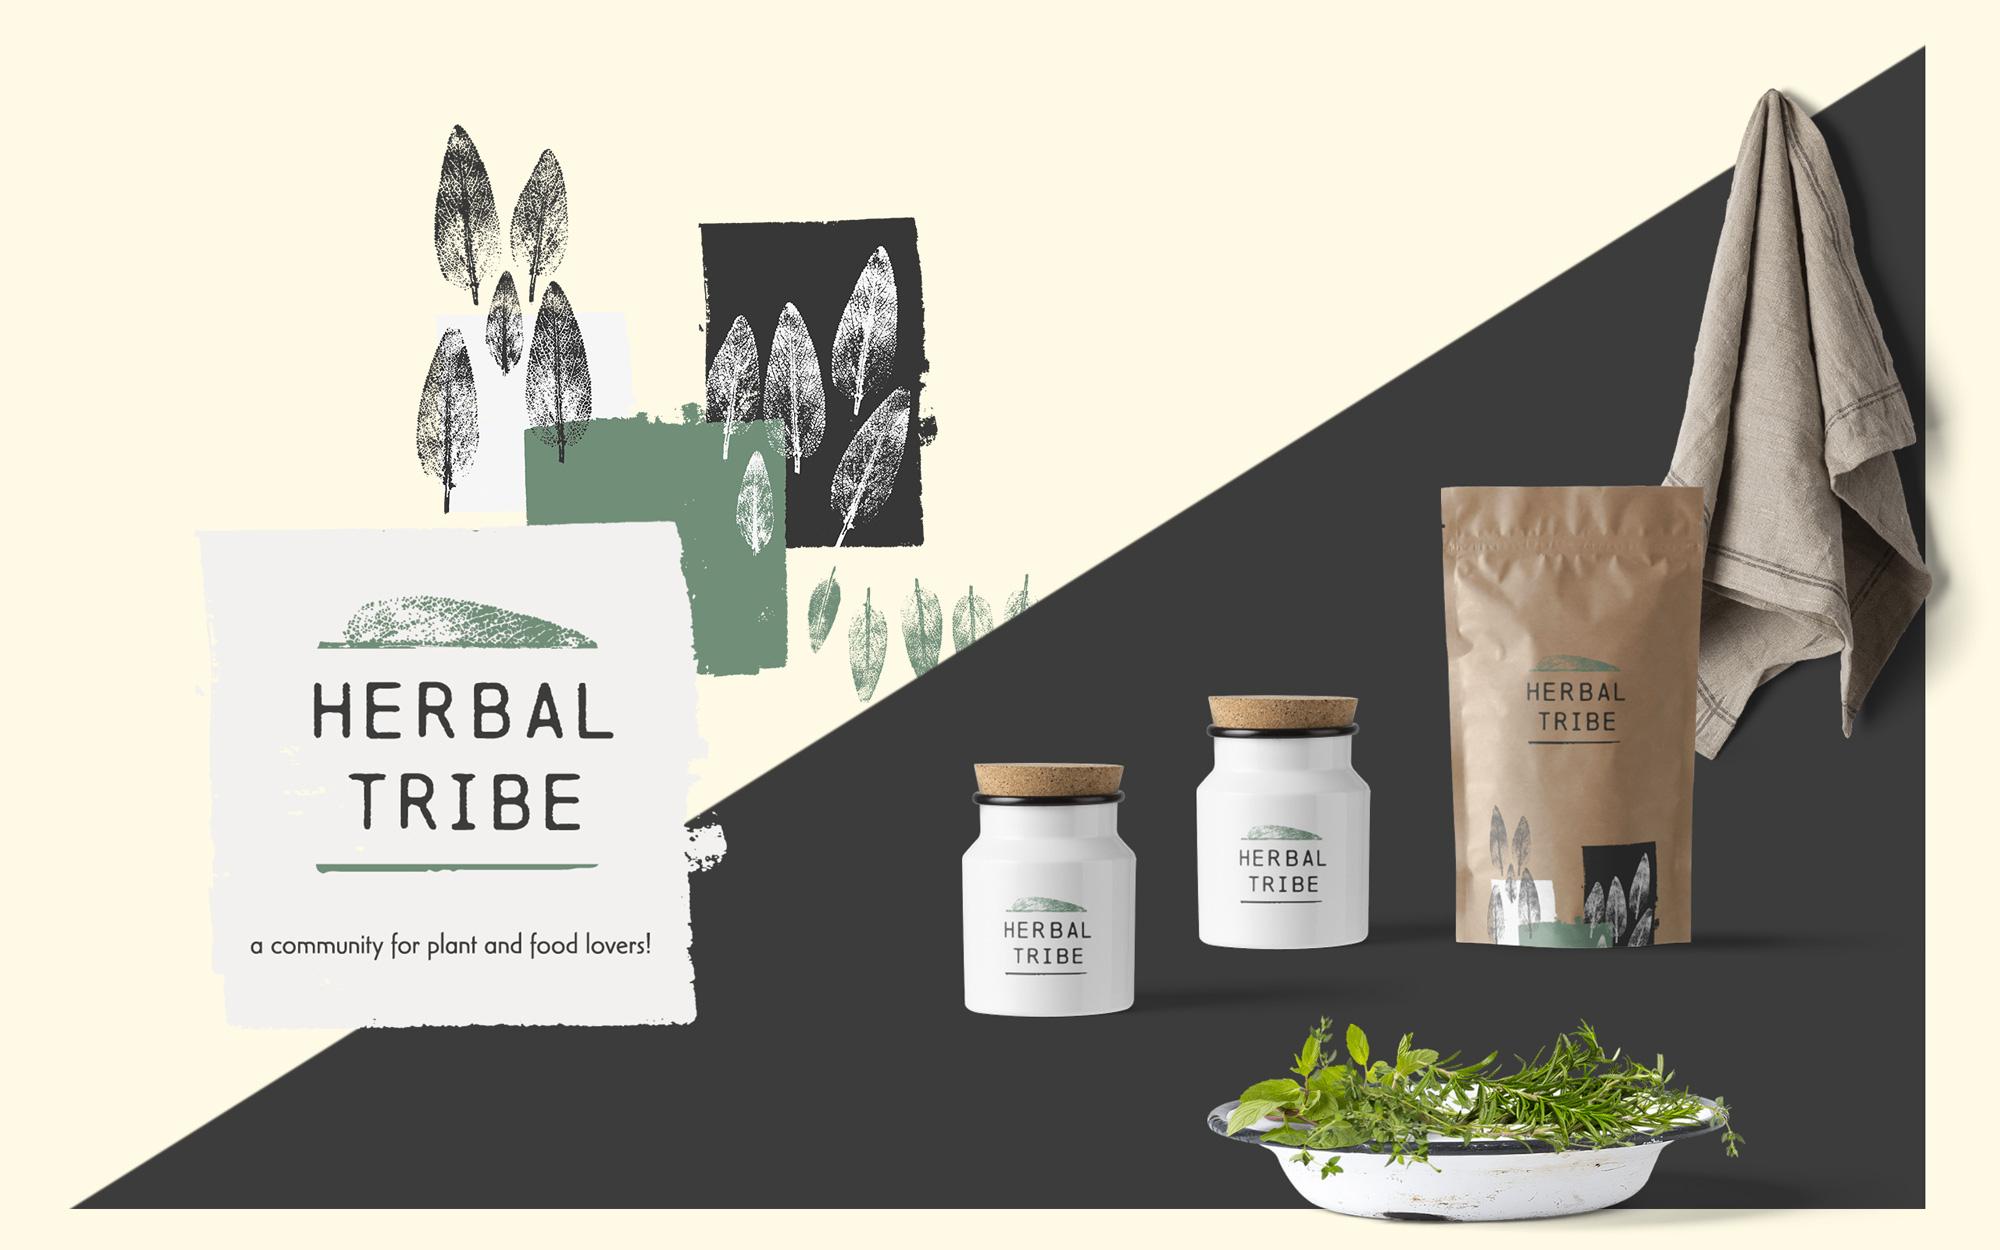 Michael-seidl-branding-herbal-tribe.jpg